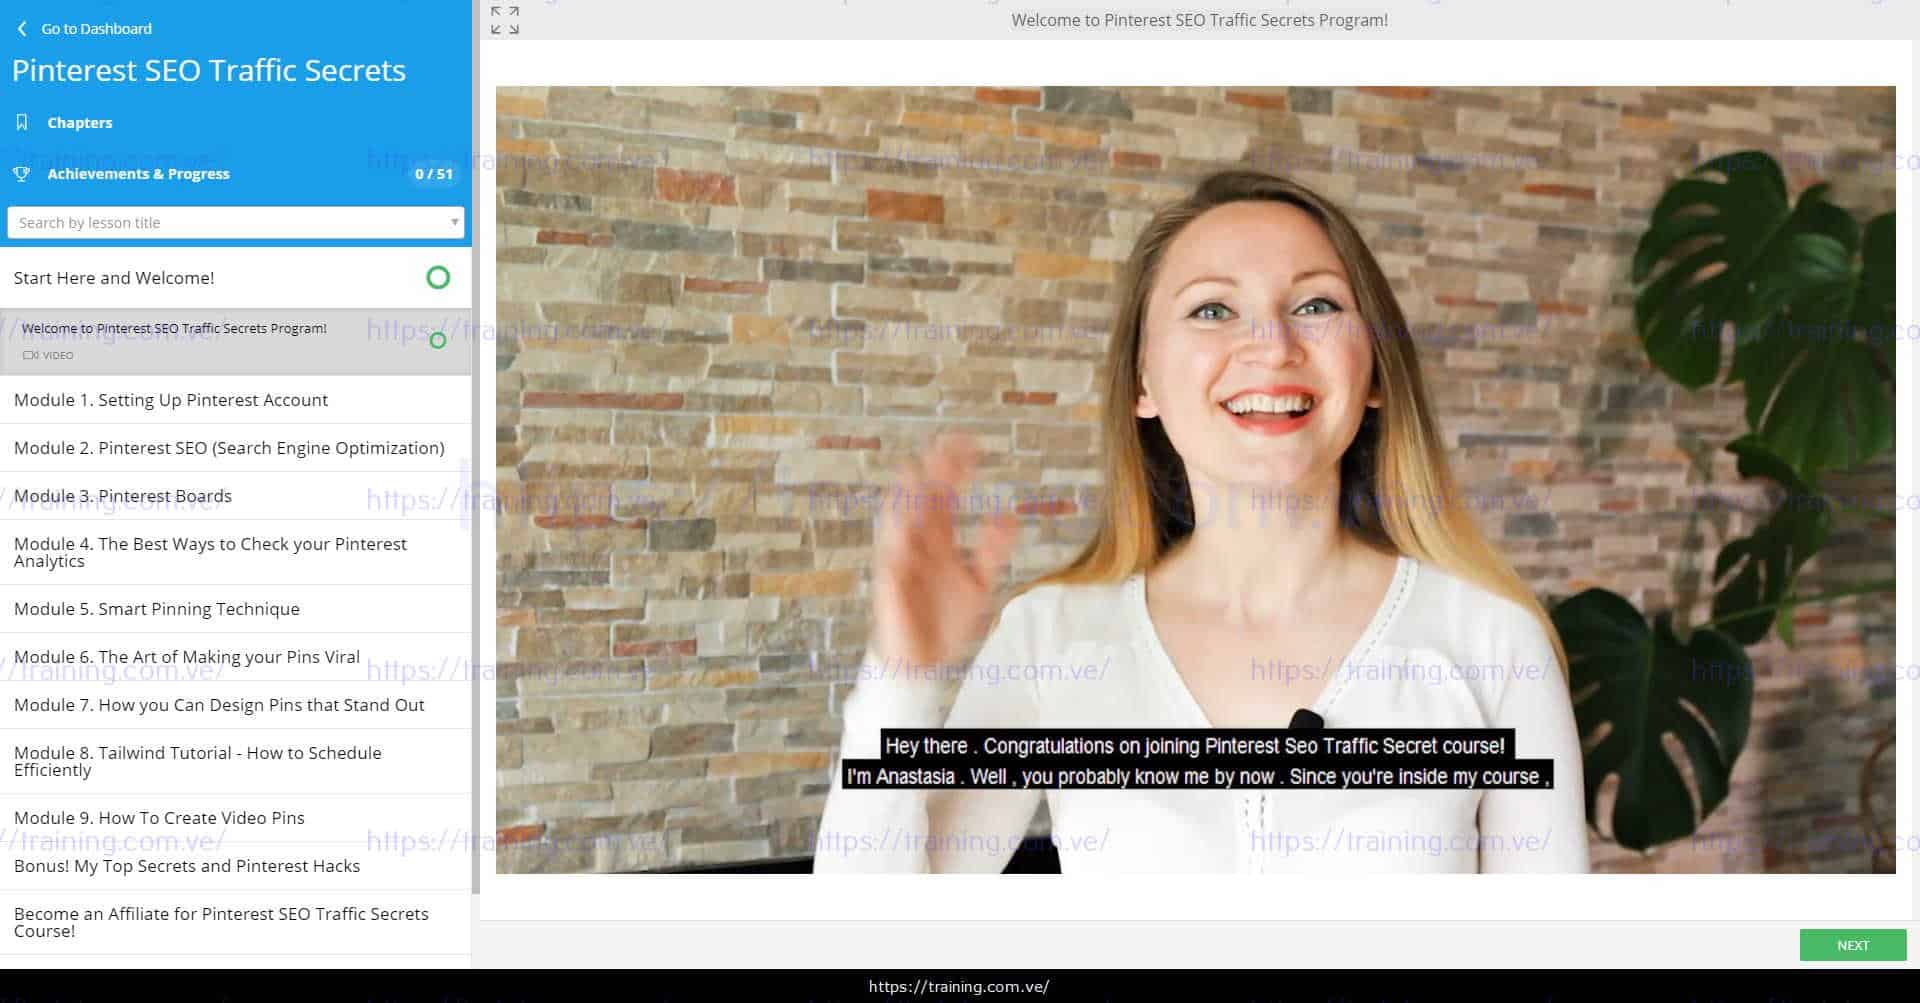 Pinterest SEO Traffic Secrets 2019 by Anastasia Blogger Download